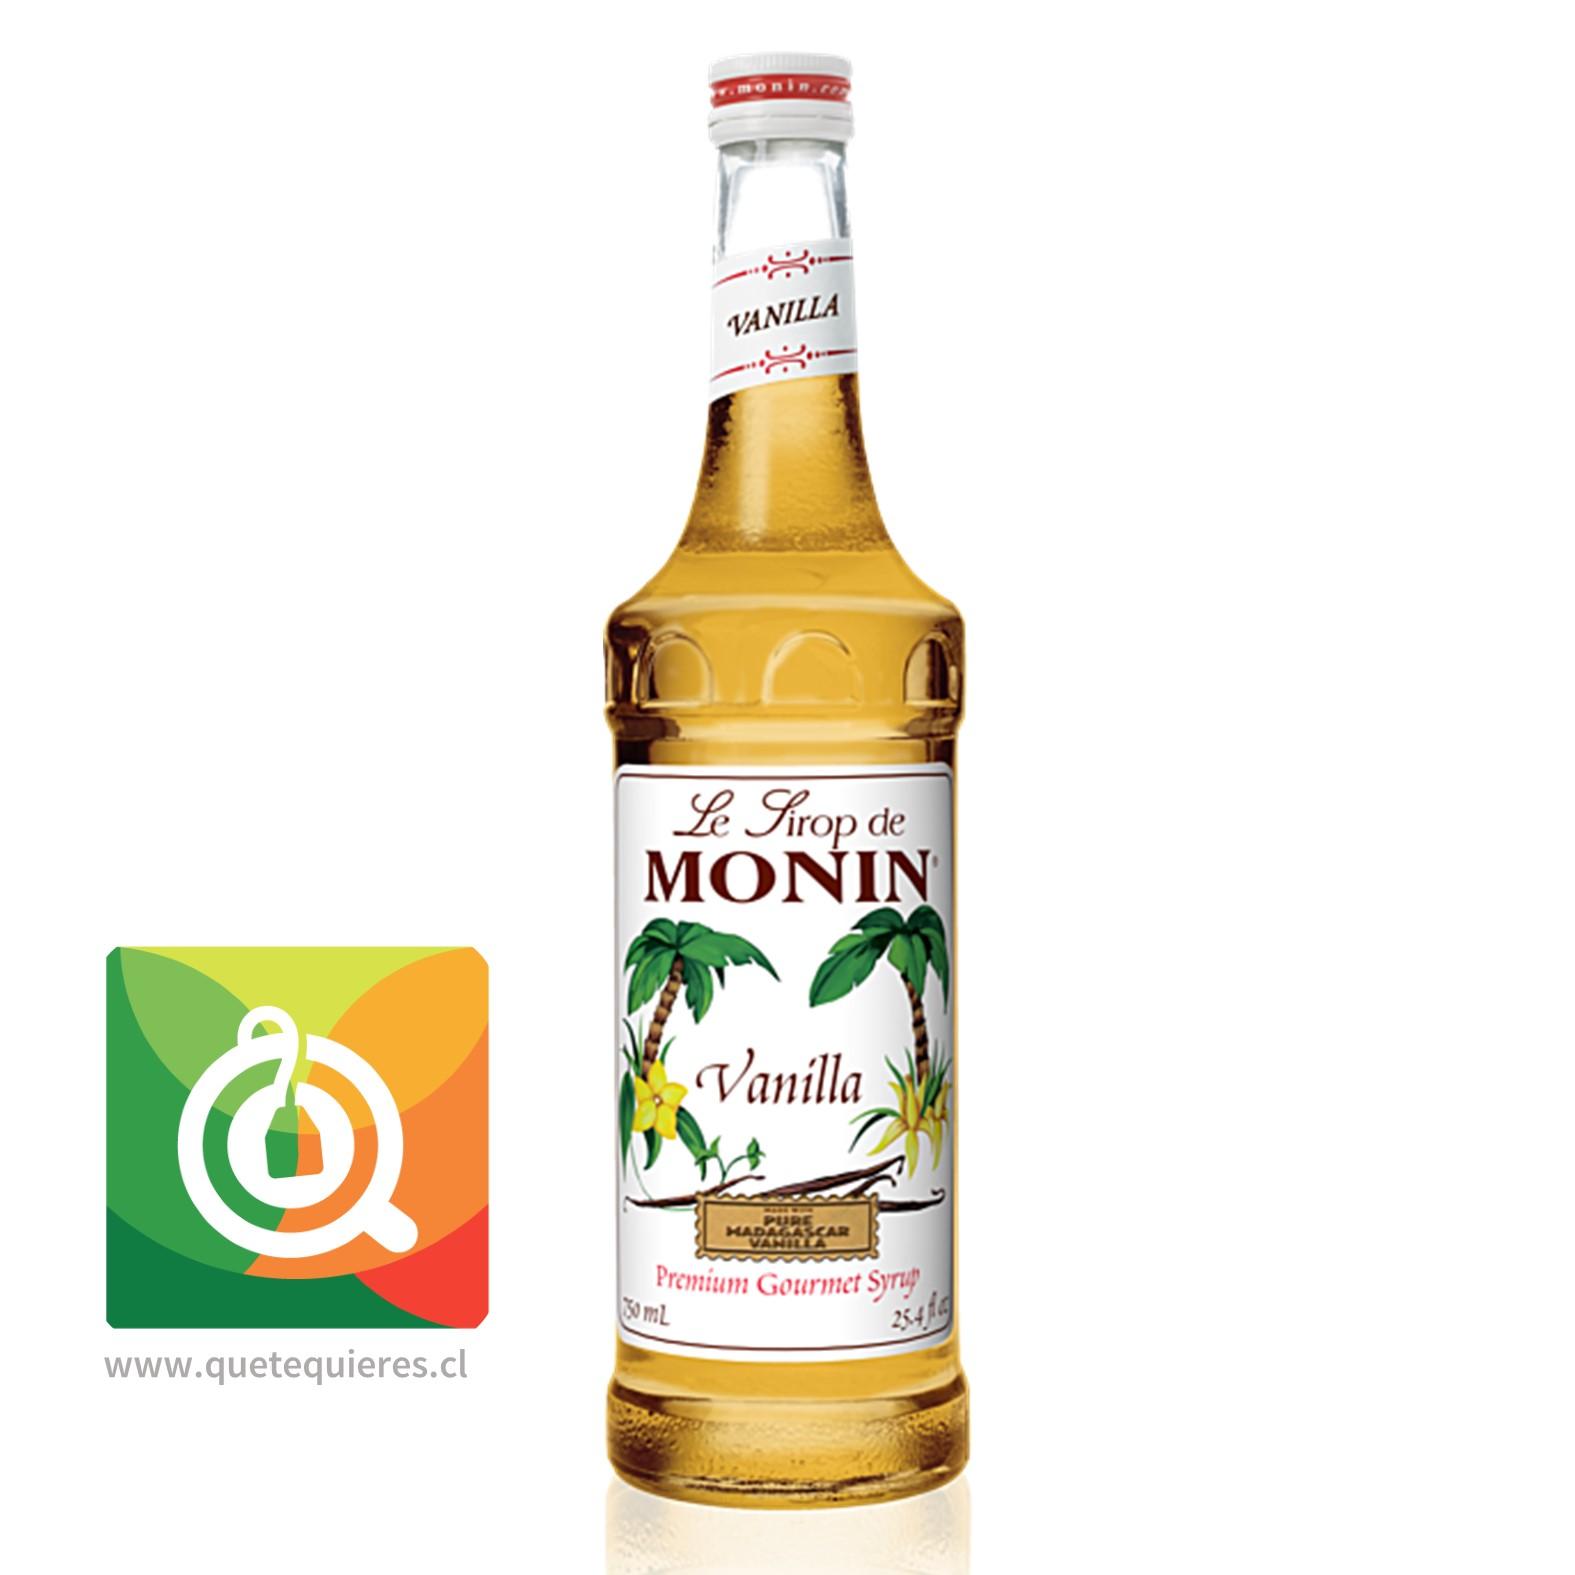 Monin Syrup Vainilla- Image 1